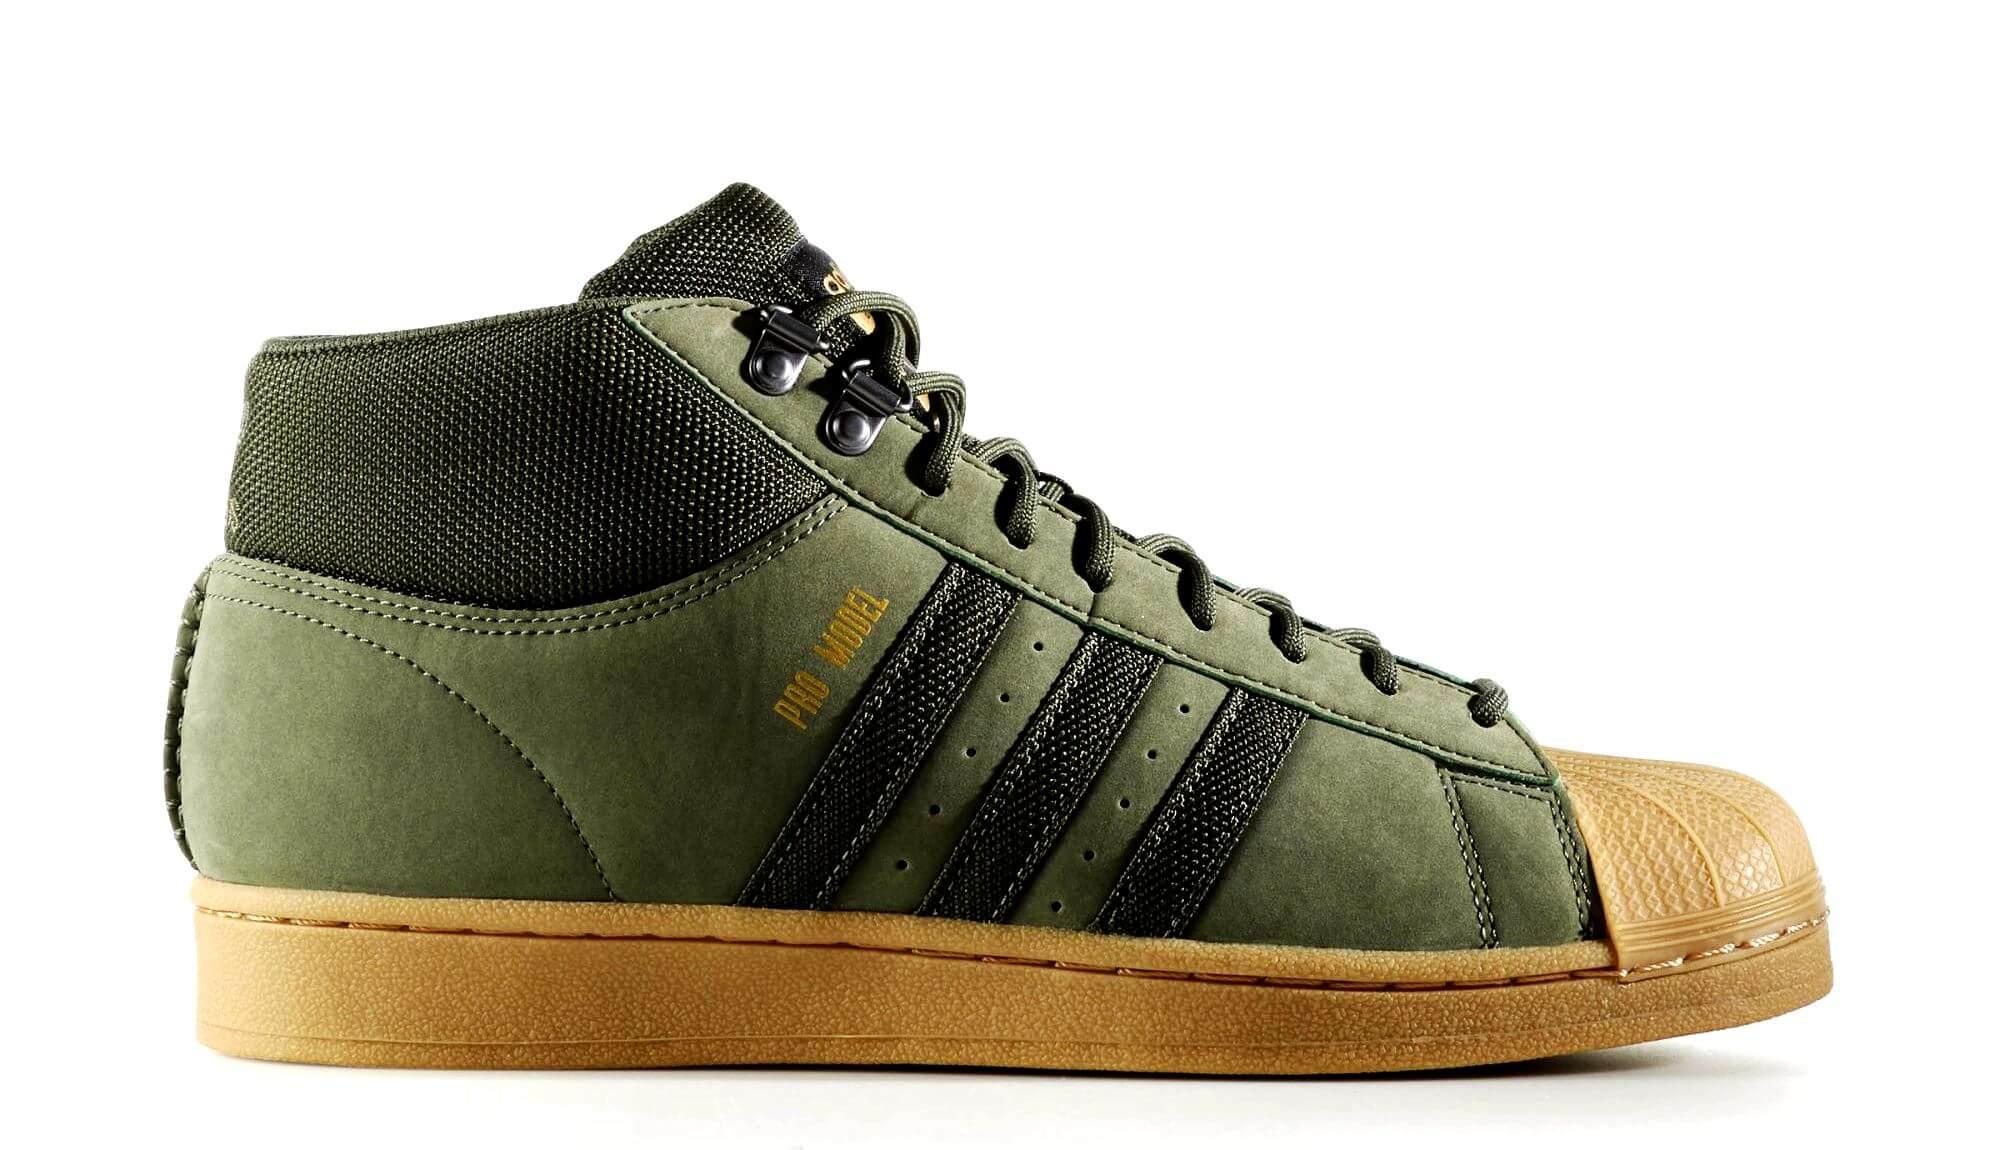 Adidas Originals Pro Model BT (Limited